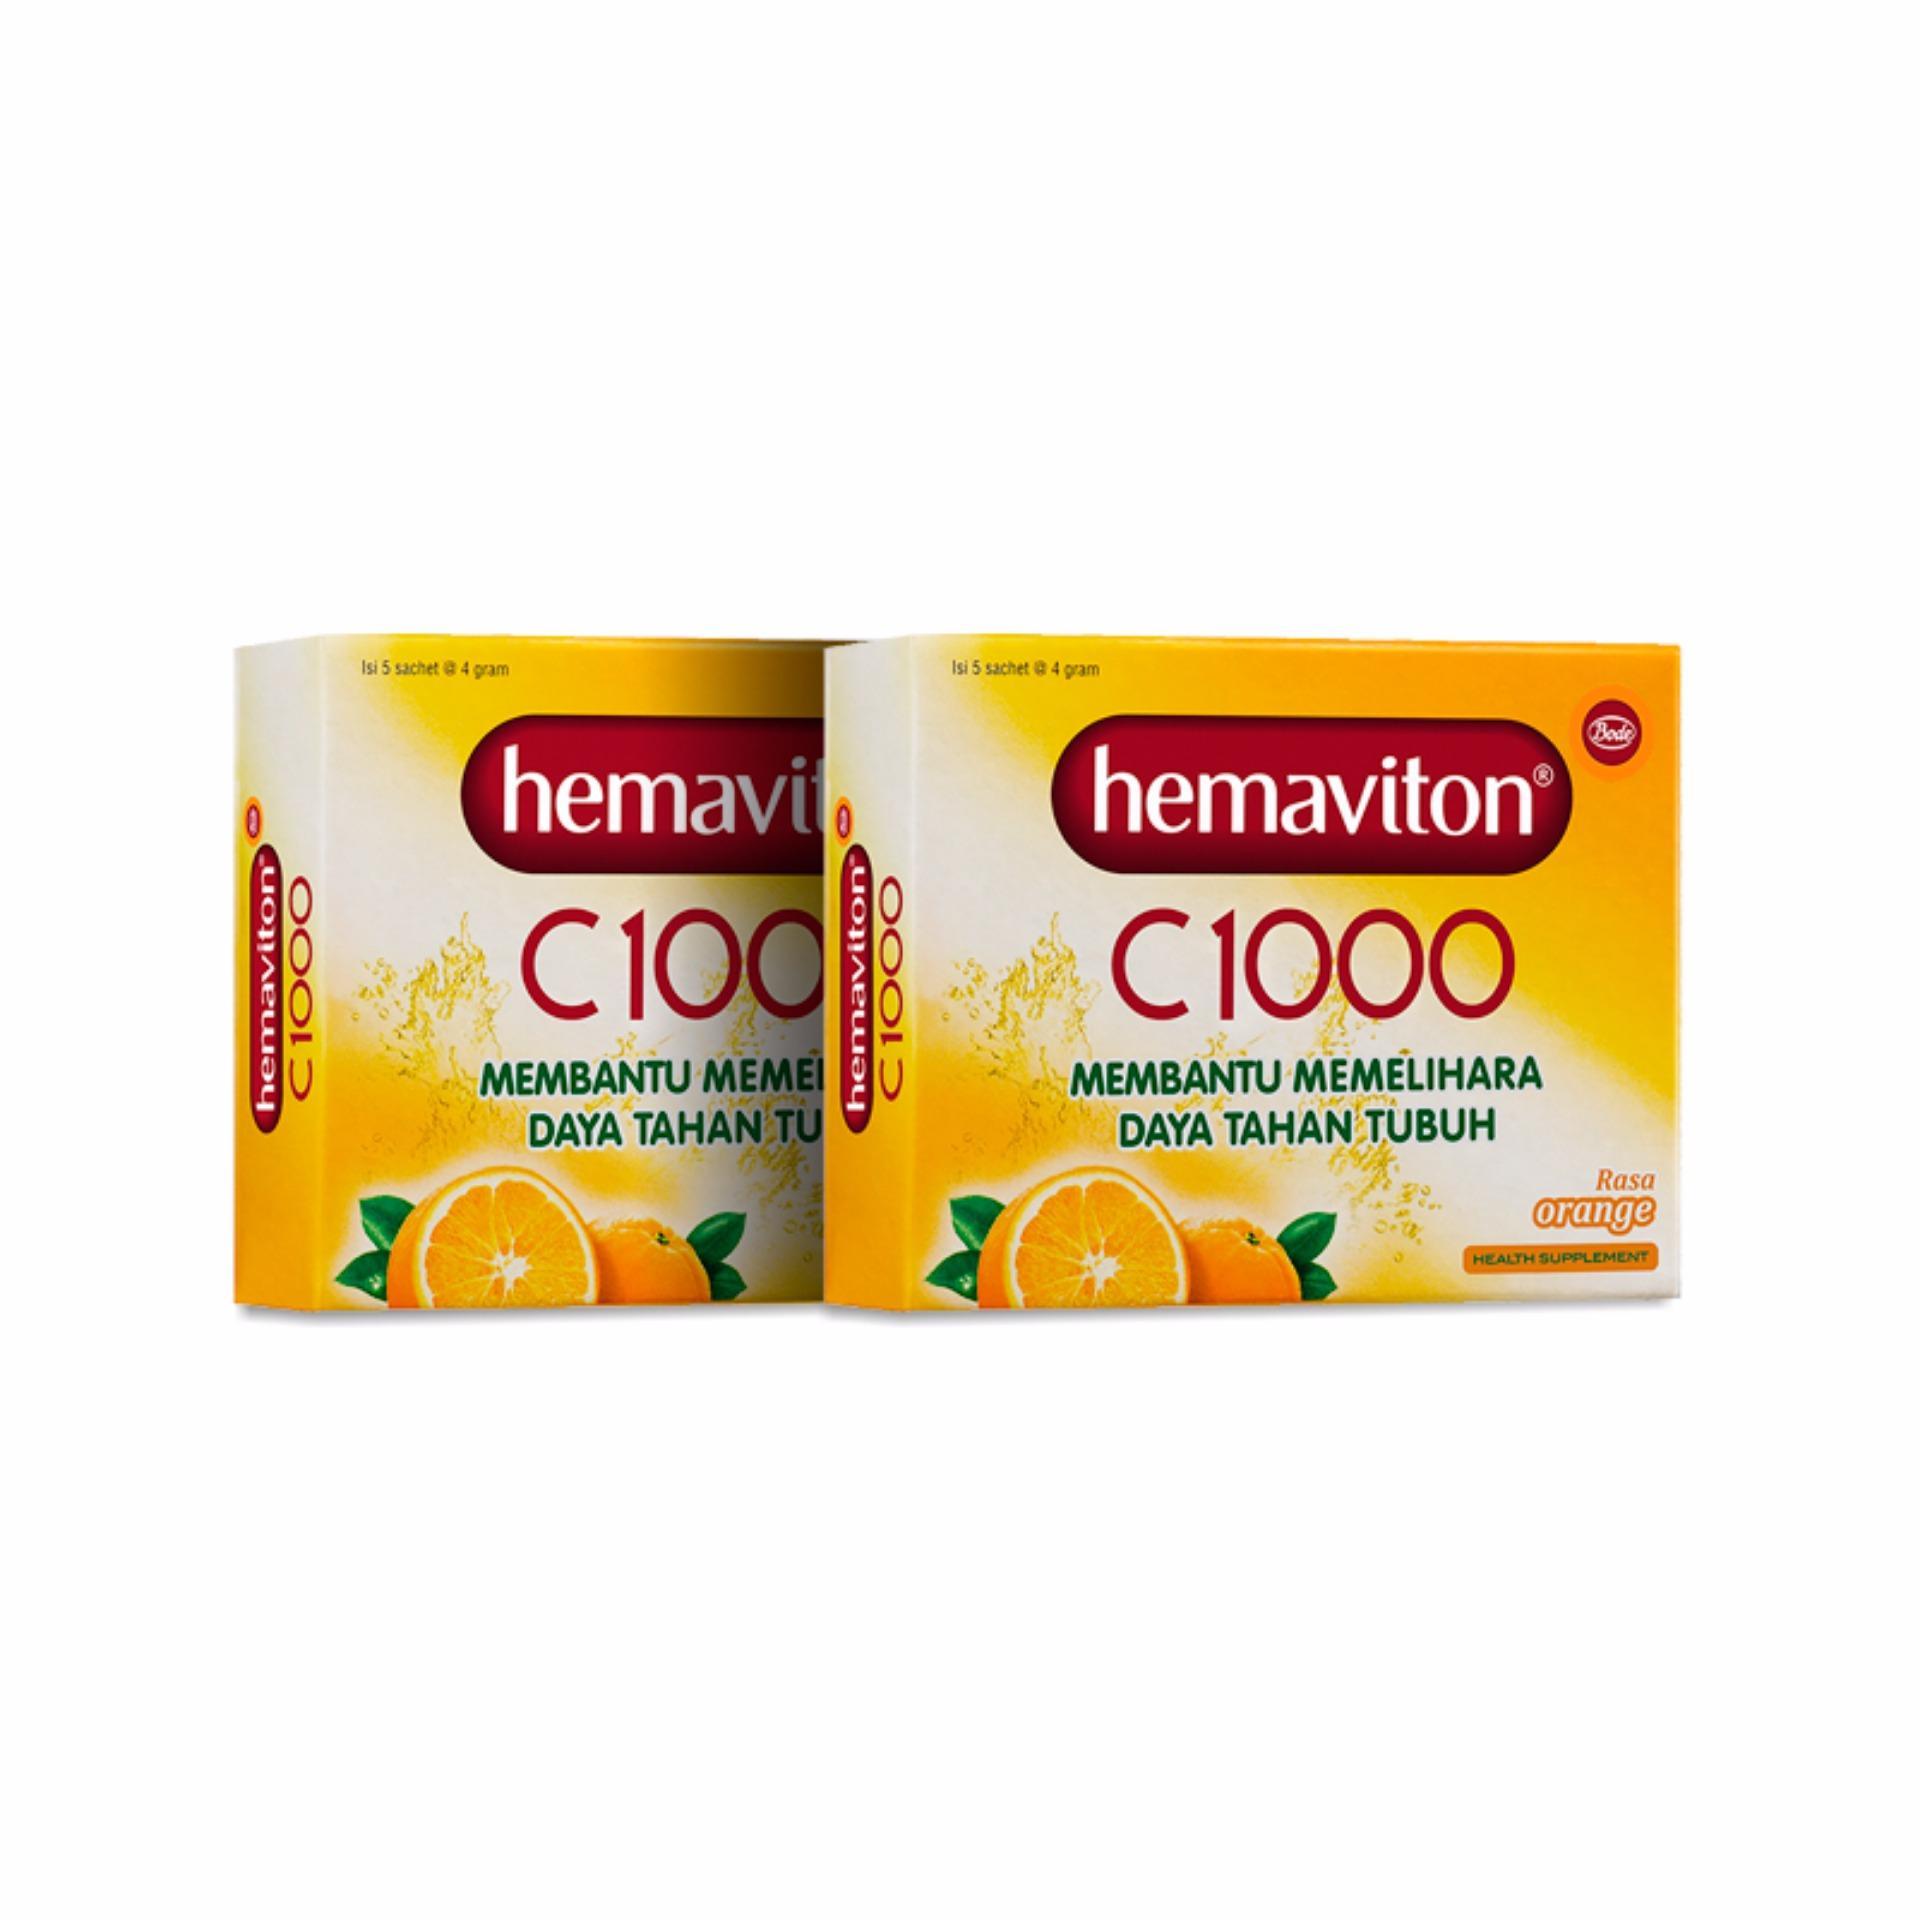 Daftar Harga Hemaviton C1000 Rasa Orange Sachet Minuman Kesehatan 4 S3 Carbo 1 Box Isi 15 Flash Sale G 2 Folding